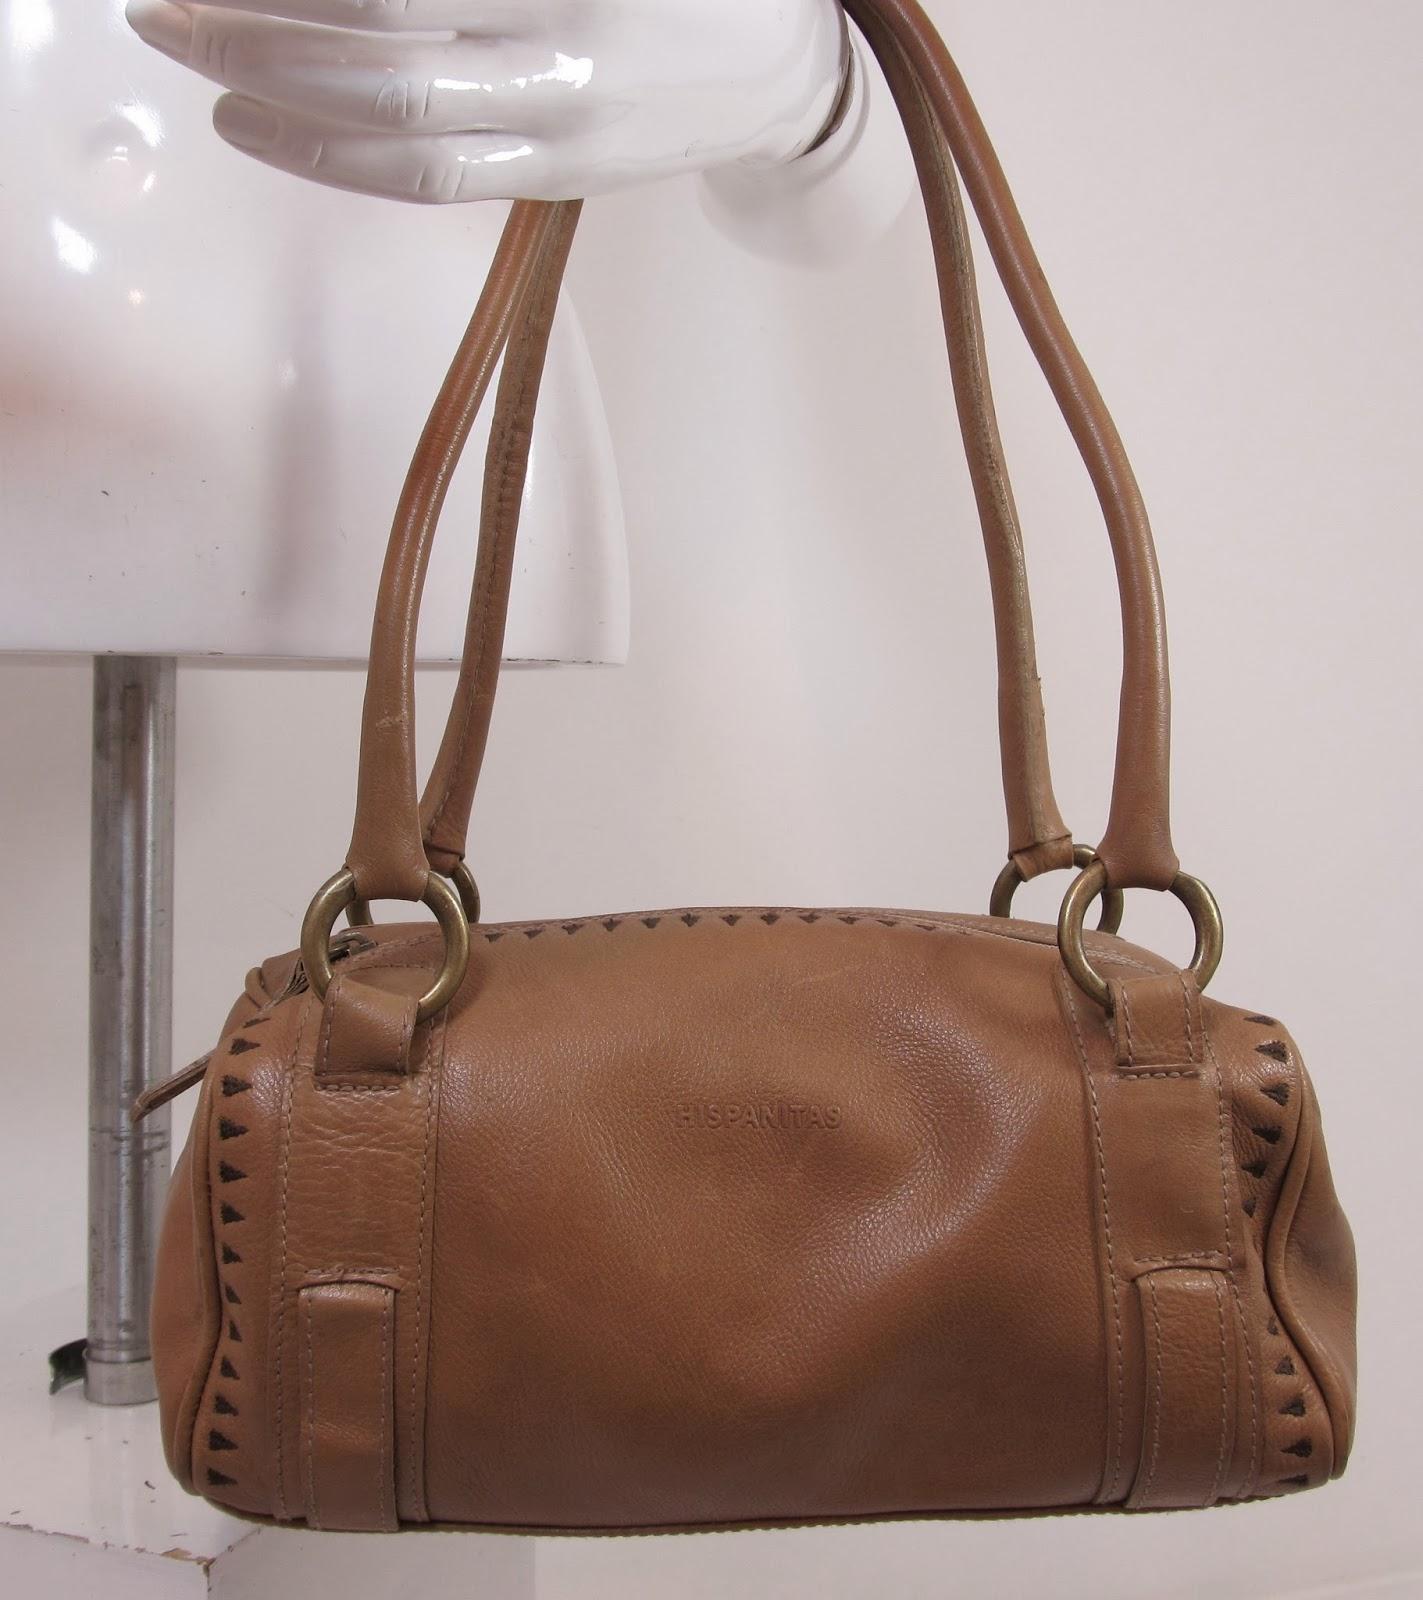 hermes birkin style bags - HISPANITAS CAMEL TAN QUALITY LEATHER HANDBAG OVER SHOULDER BAG ...